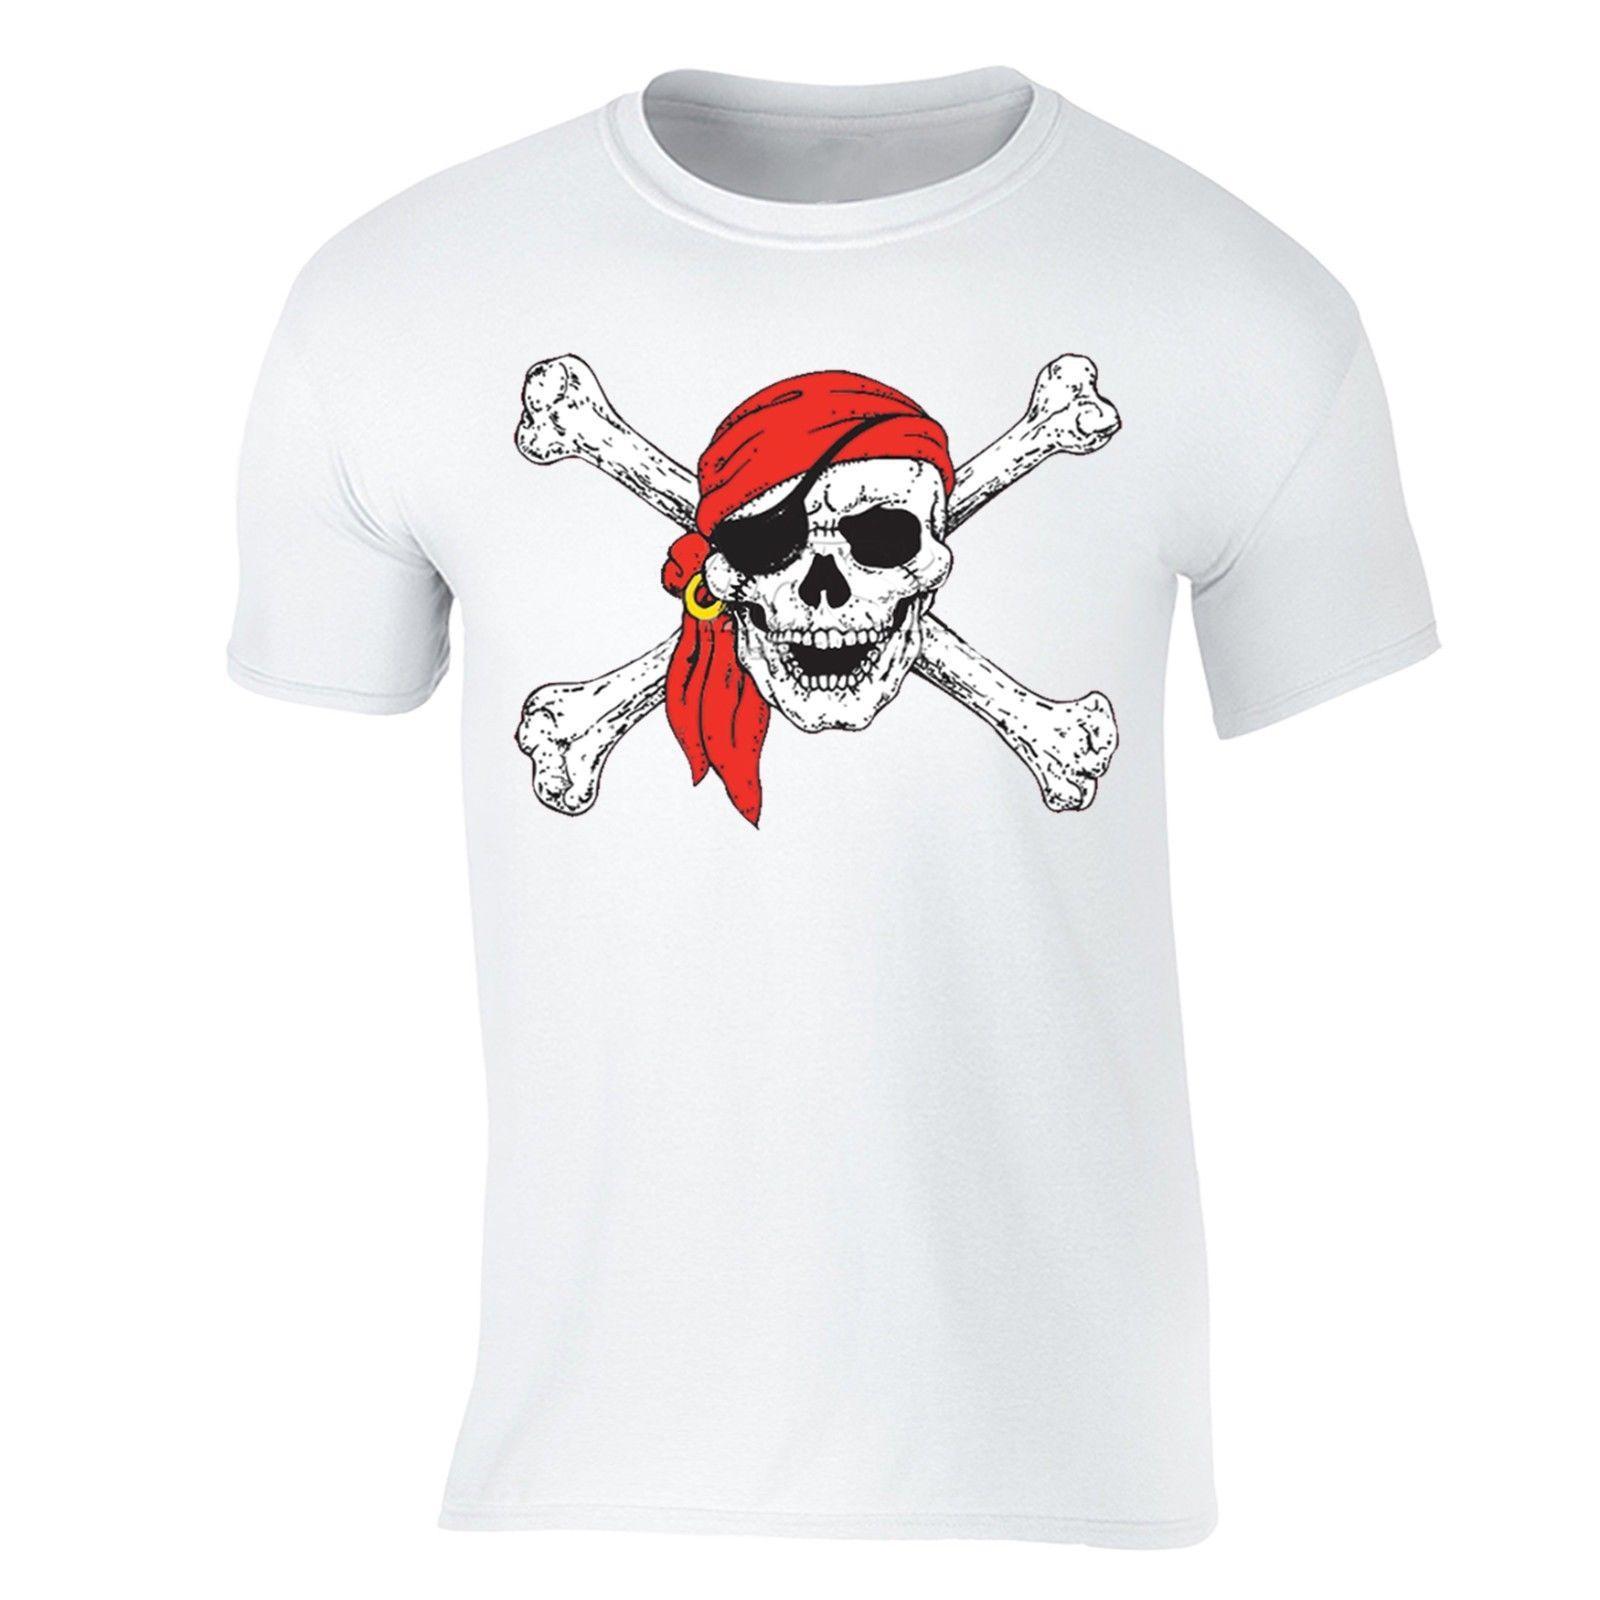 b767842ea179 Jolly Roger Skull & Crossbones T Shirt Pirate Flag Shirt Military Navy  Tshirt Jersey Print T Shirt Brand Shirts Jeans Print Art T Shirts The Who T  Shirt ...